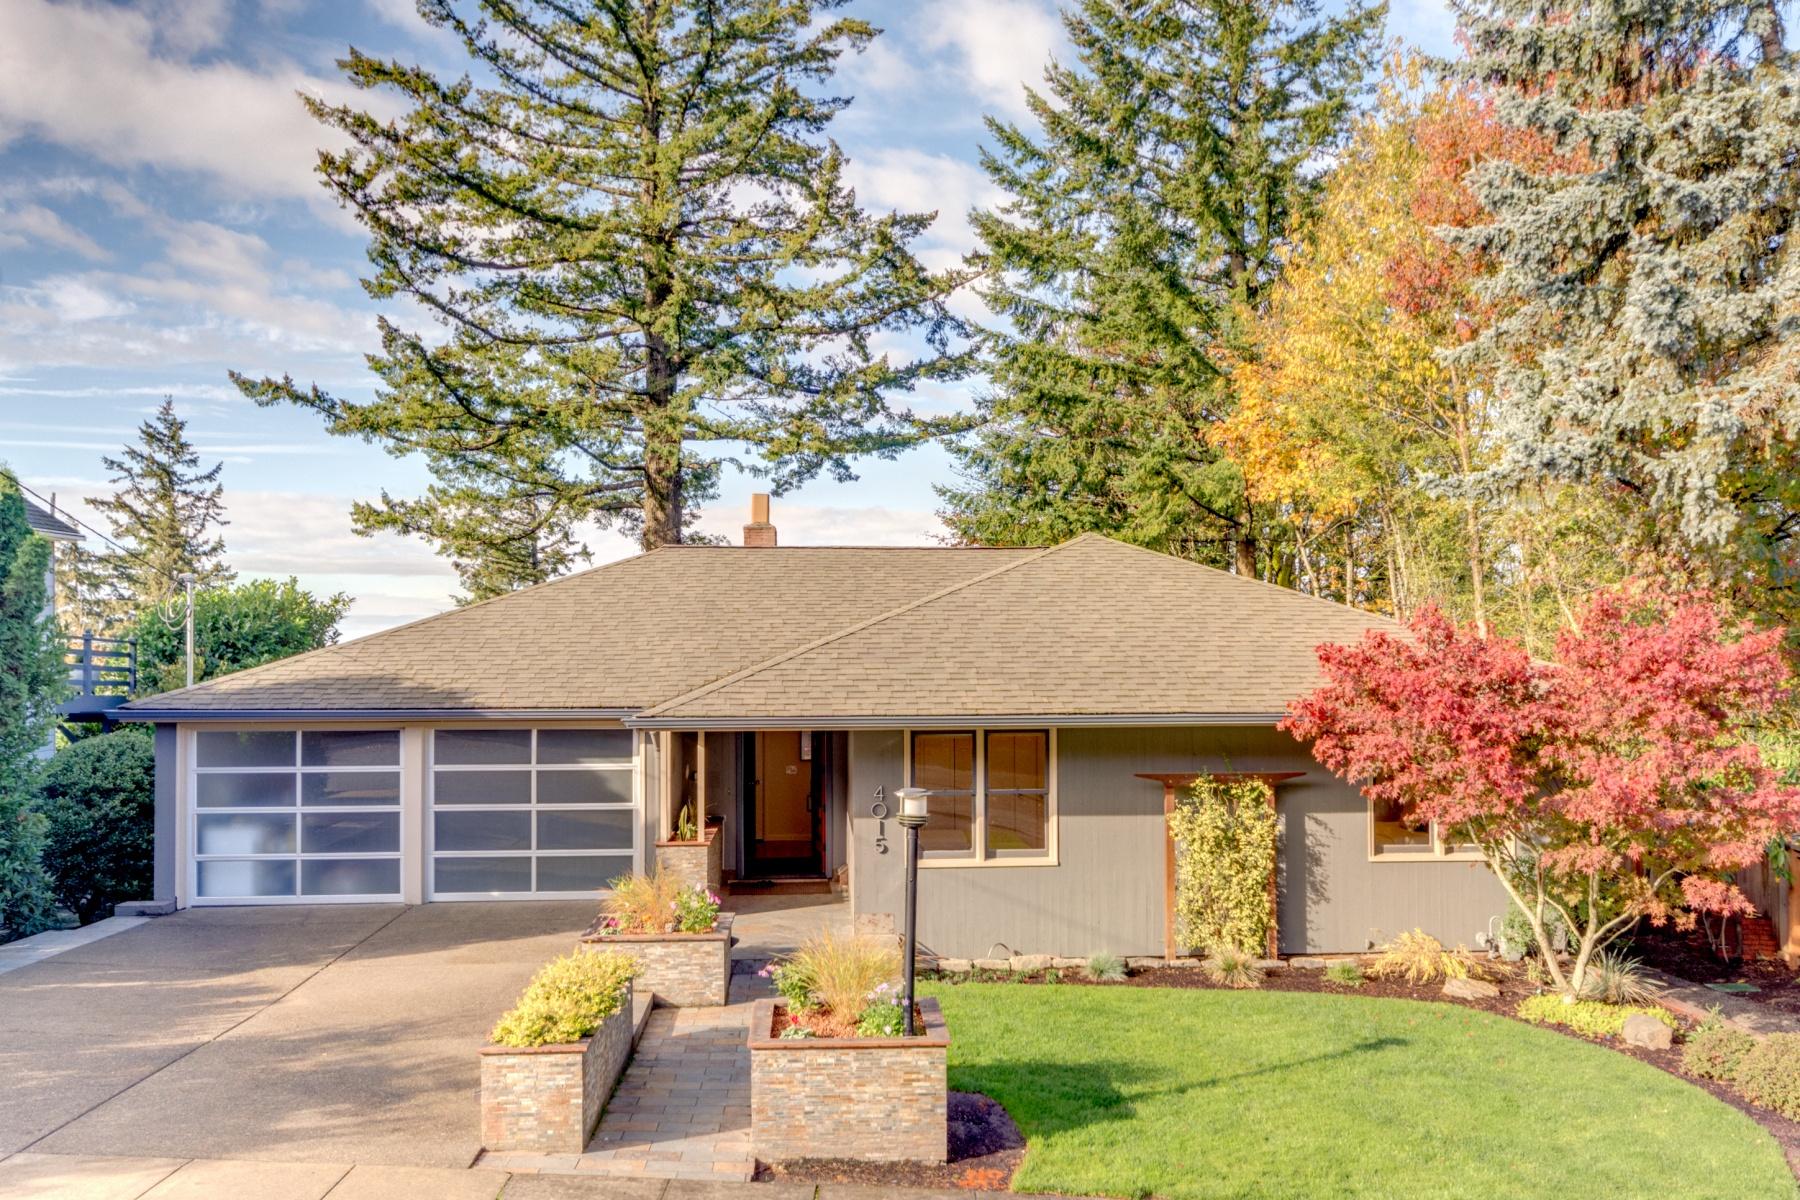 独户住宅 为 销售 在 Magnificent Council Crest 4015 SW COUNCIL CREST Dr 波特兰, 俄勒冈州, 97239 美国